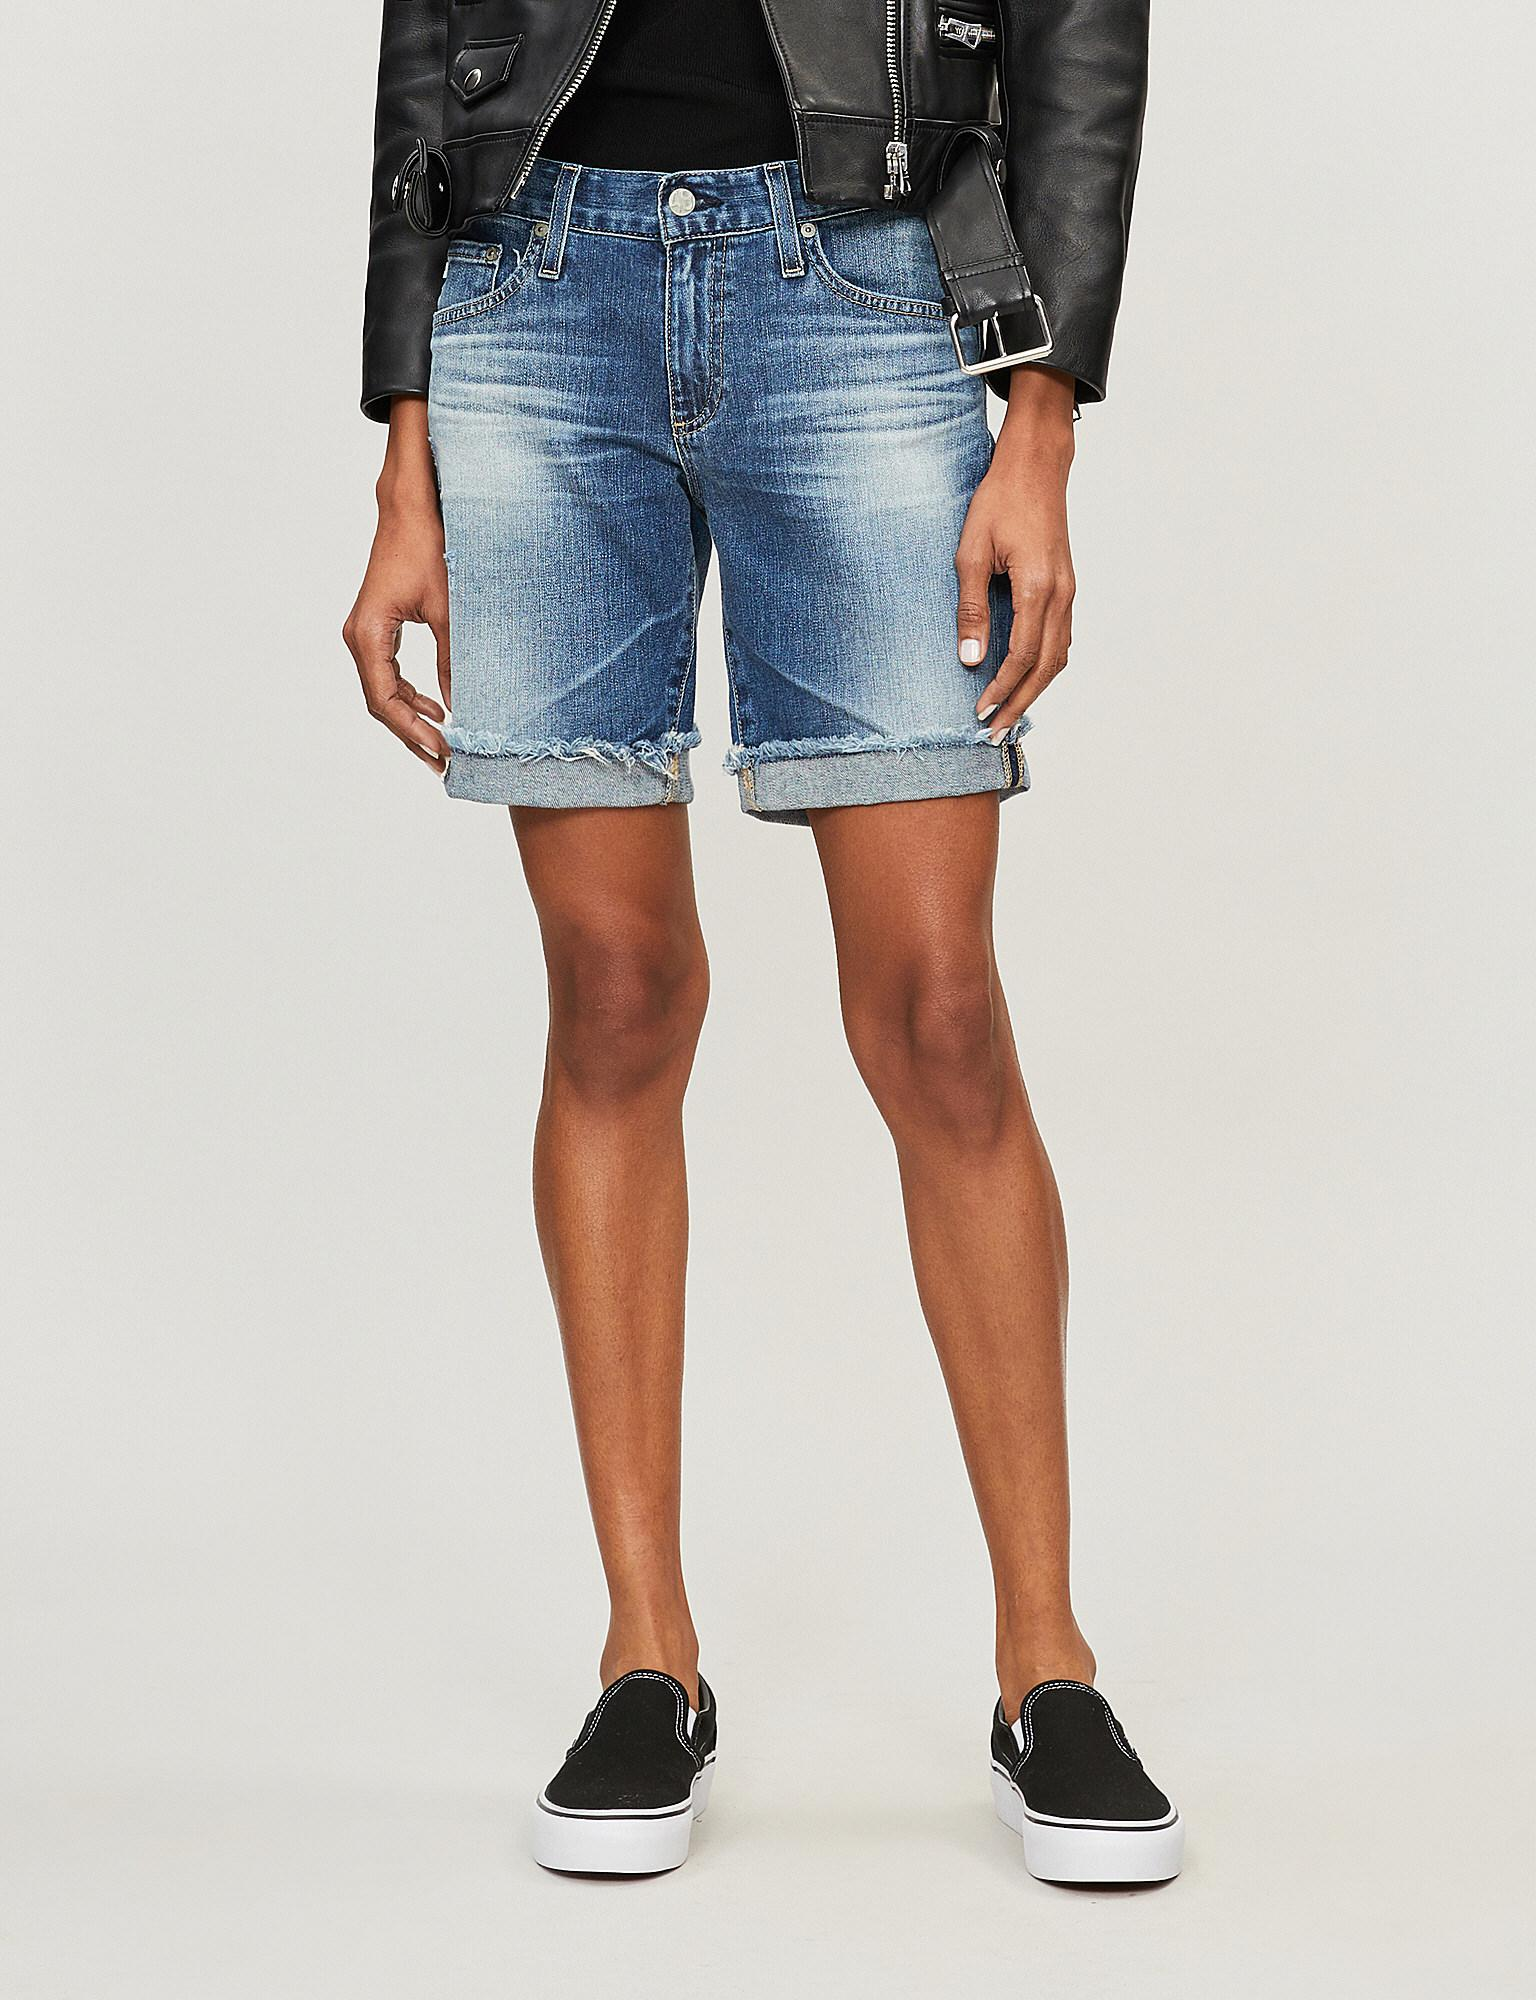 75f0ad391d Lyst - AG Jeans Nikki Skinny Mid-rise Denim Shorts in Blue